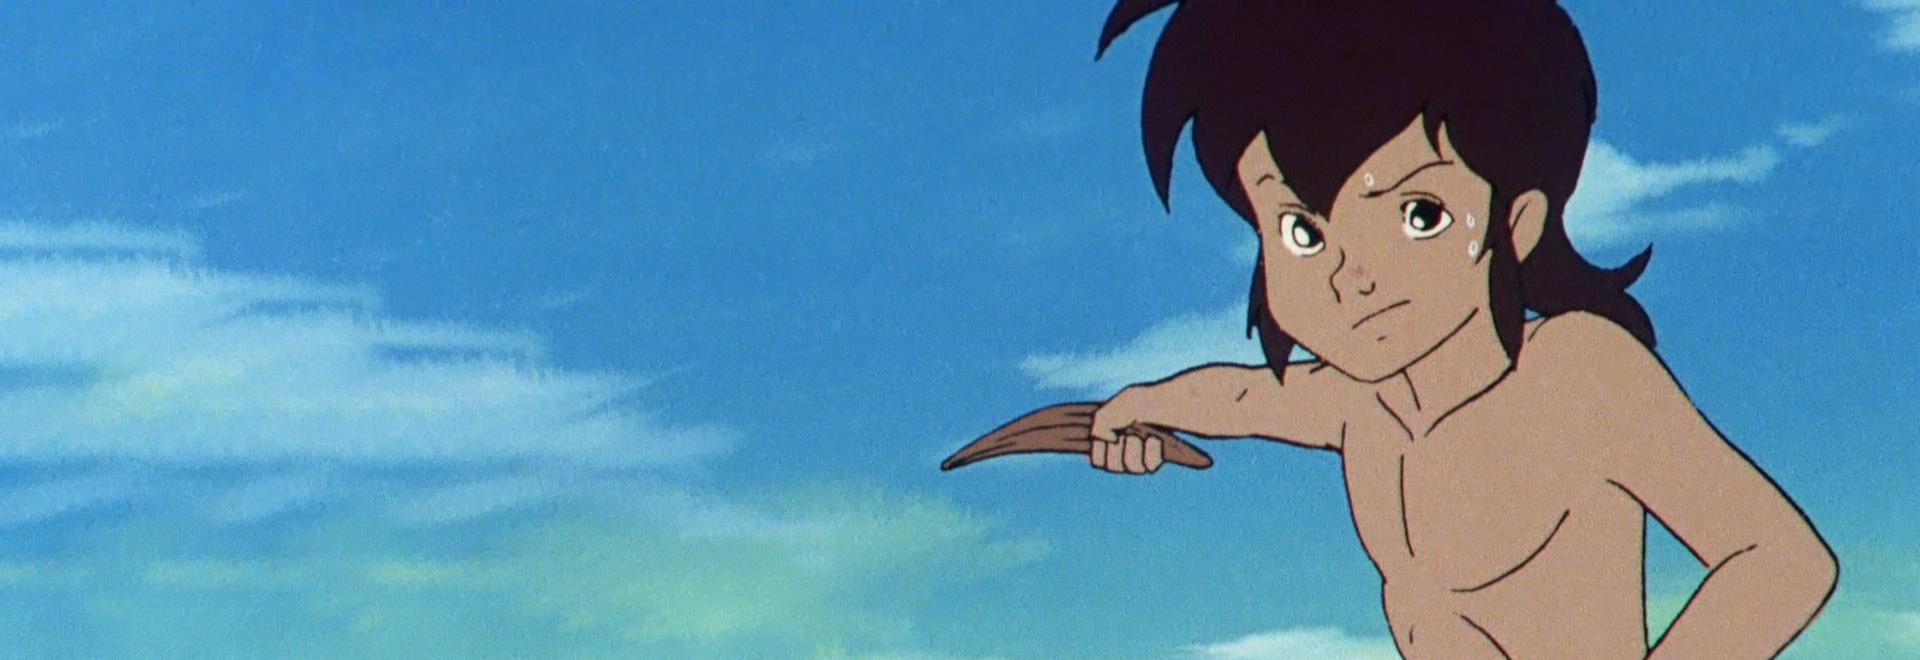 La tana di Mowgli